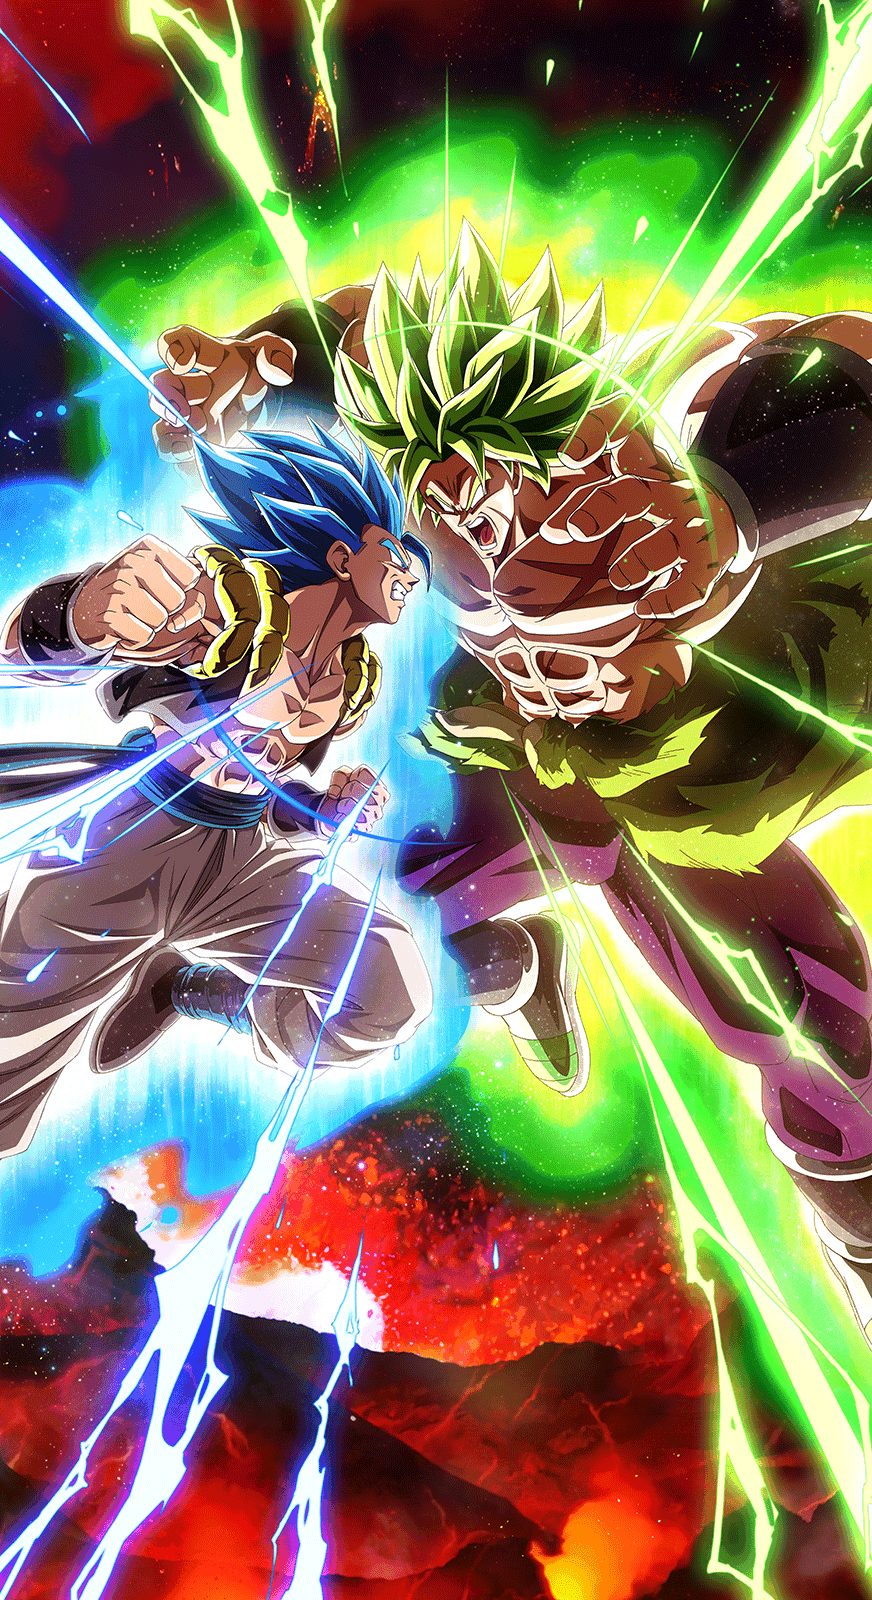 Super Saiyan Blue Gogeta Vs Full Power Broly 5th Year Anniversary